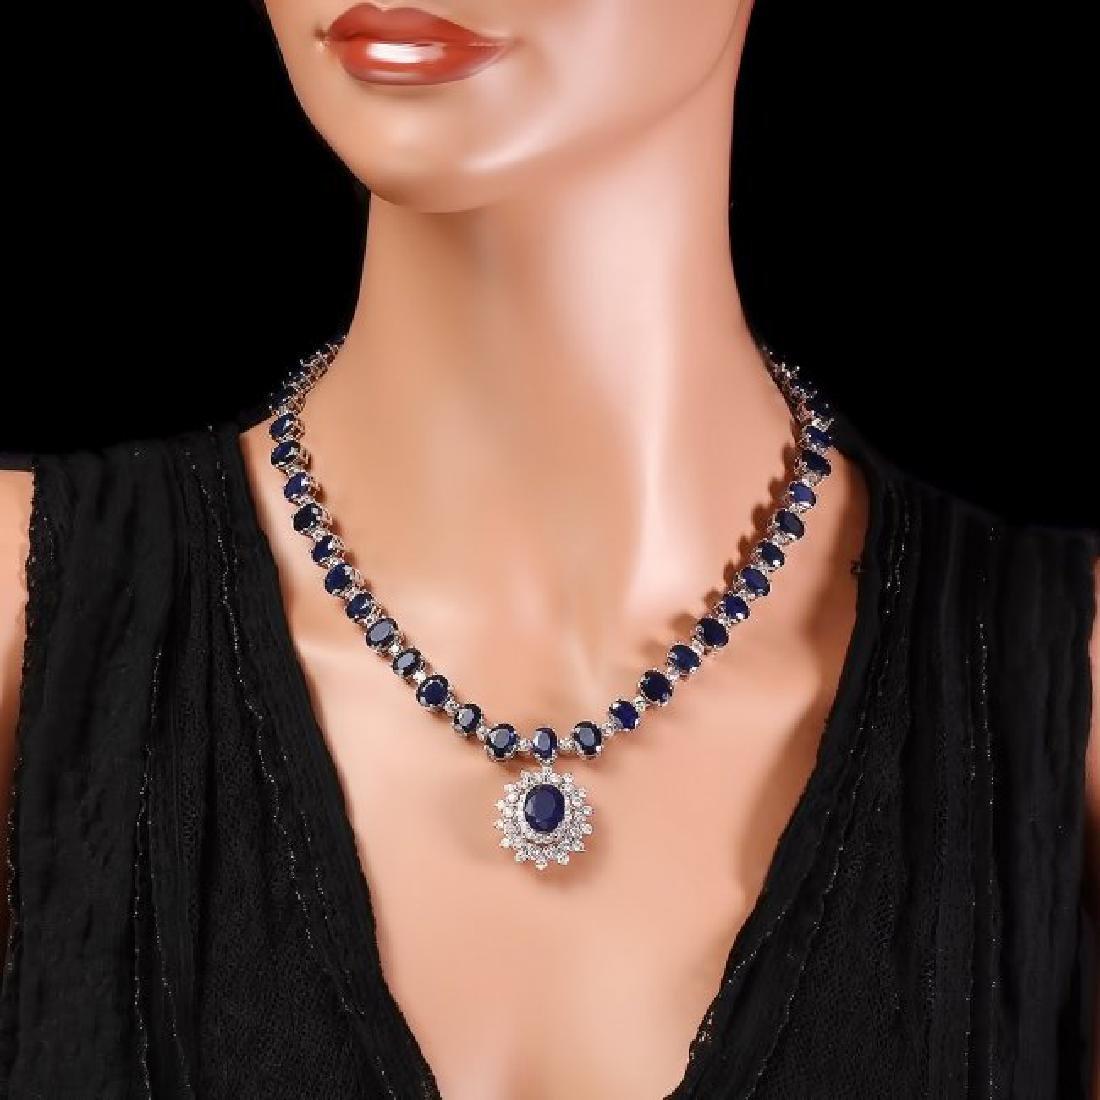 14k Gold 86ct Sapphire 2.50ct Diamond Necklace - 6